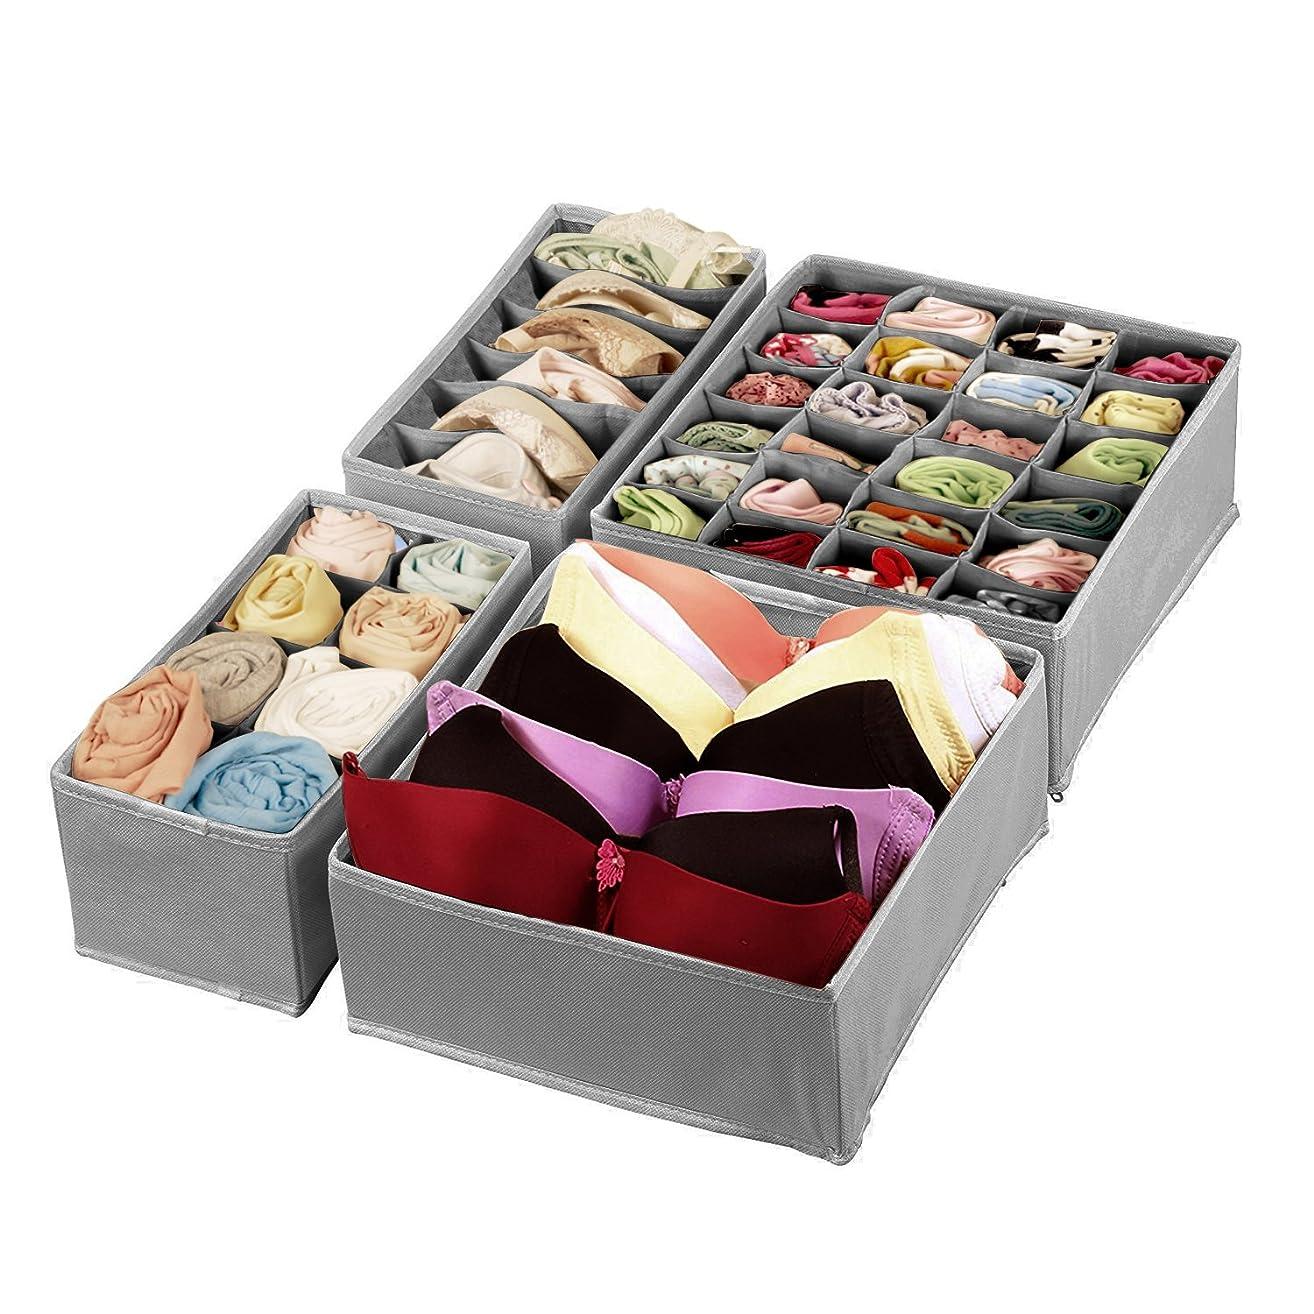 Magicfly Sock Organizer, Foldable Underwear Drawer Organizer, Upgrade Sturdy Closet Storage Divider for Bra Panties Ties Socks, Set of 4, Gray